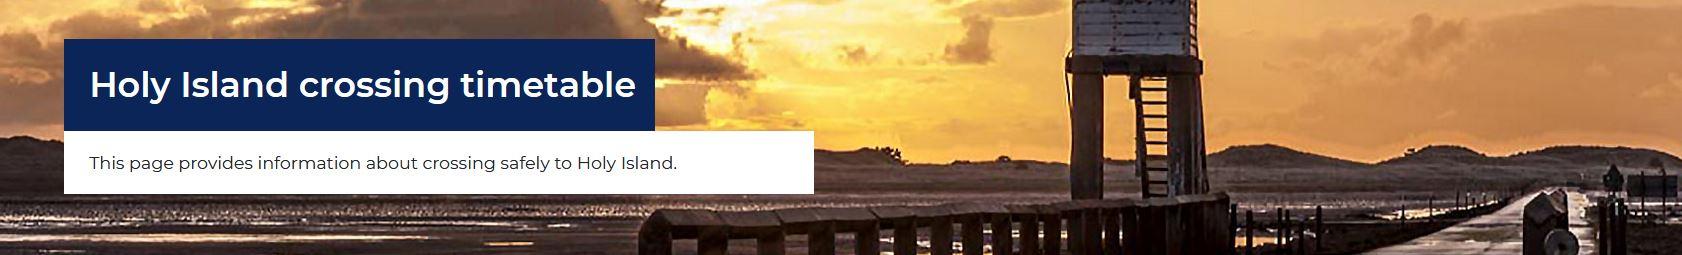 Holy Island tide table